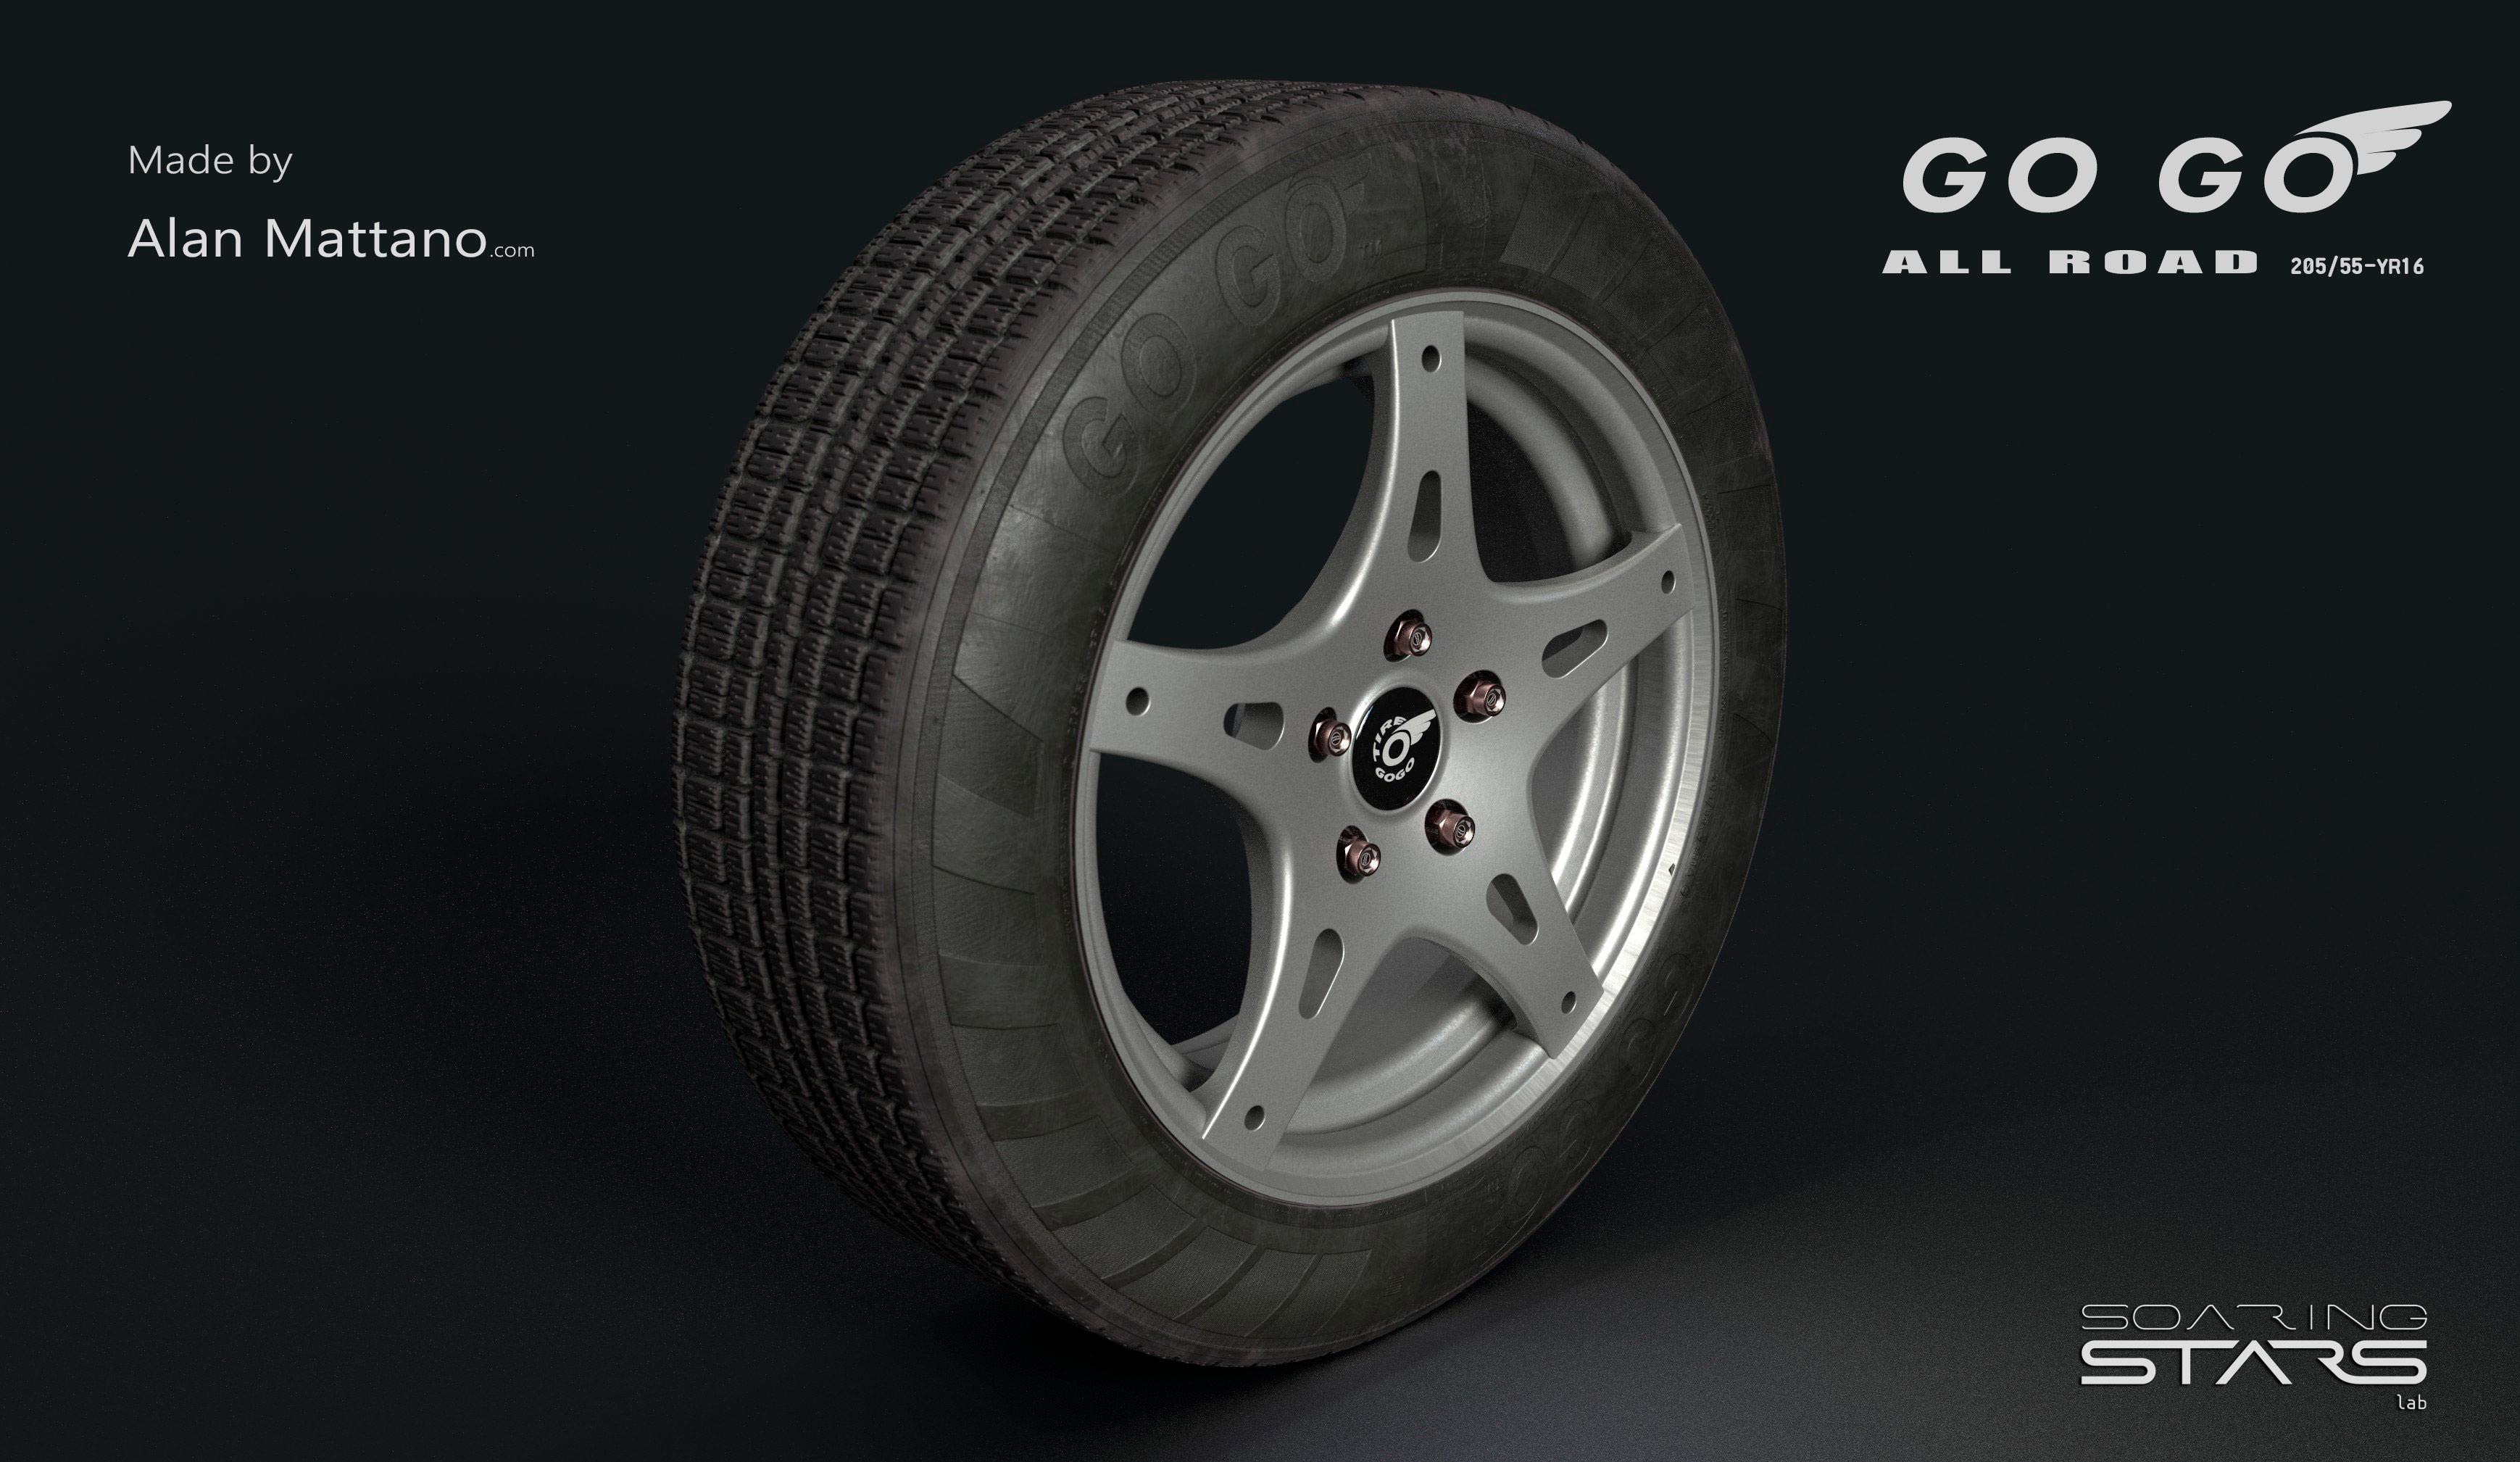 GOGO-Tire-205-55-R16-06.jpg